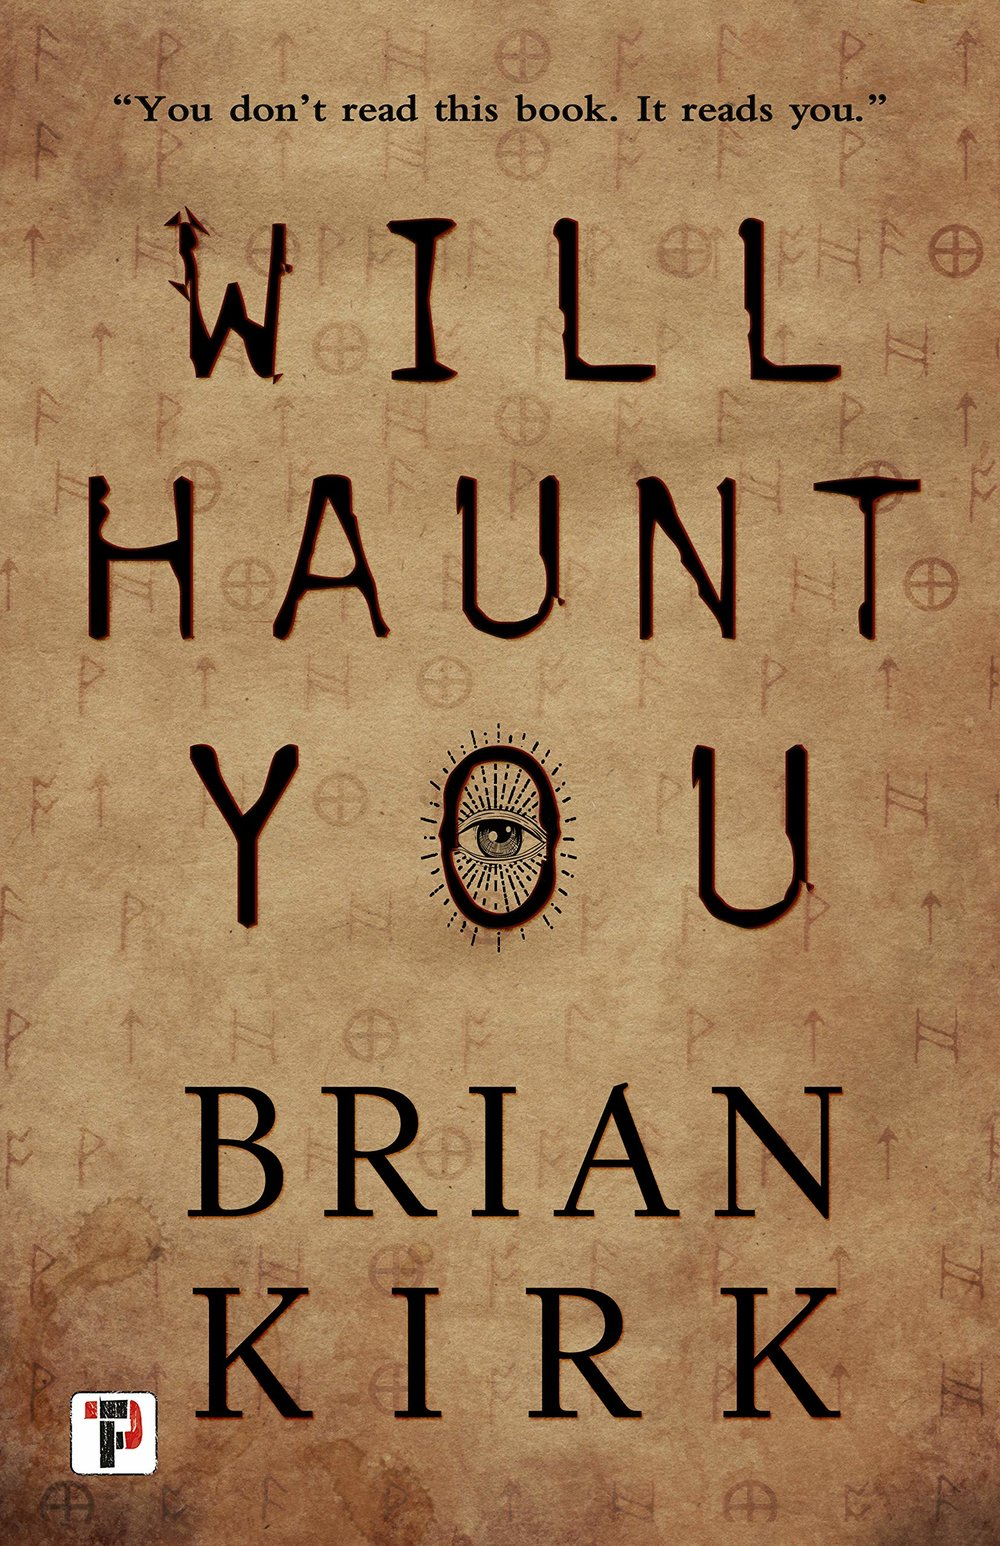 Will Haunt You_Brian Kirk.jpg